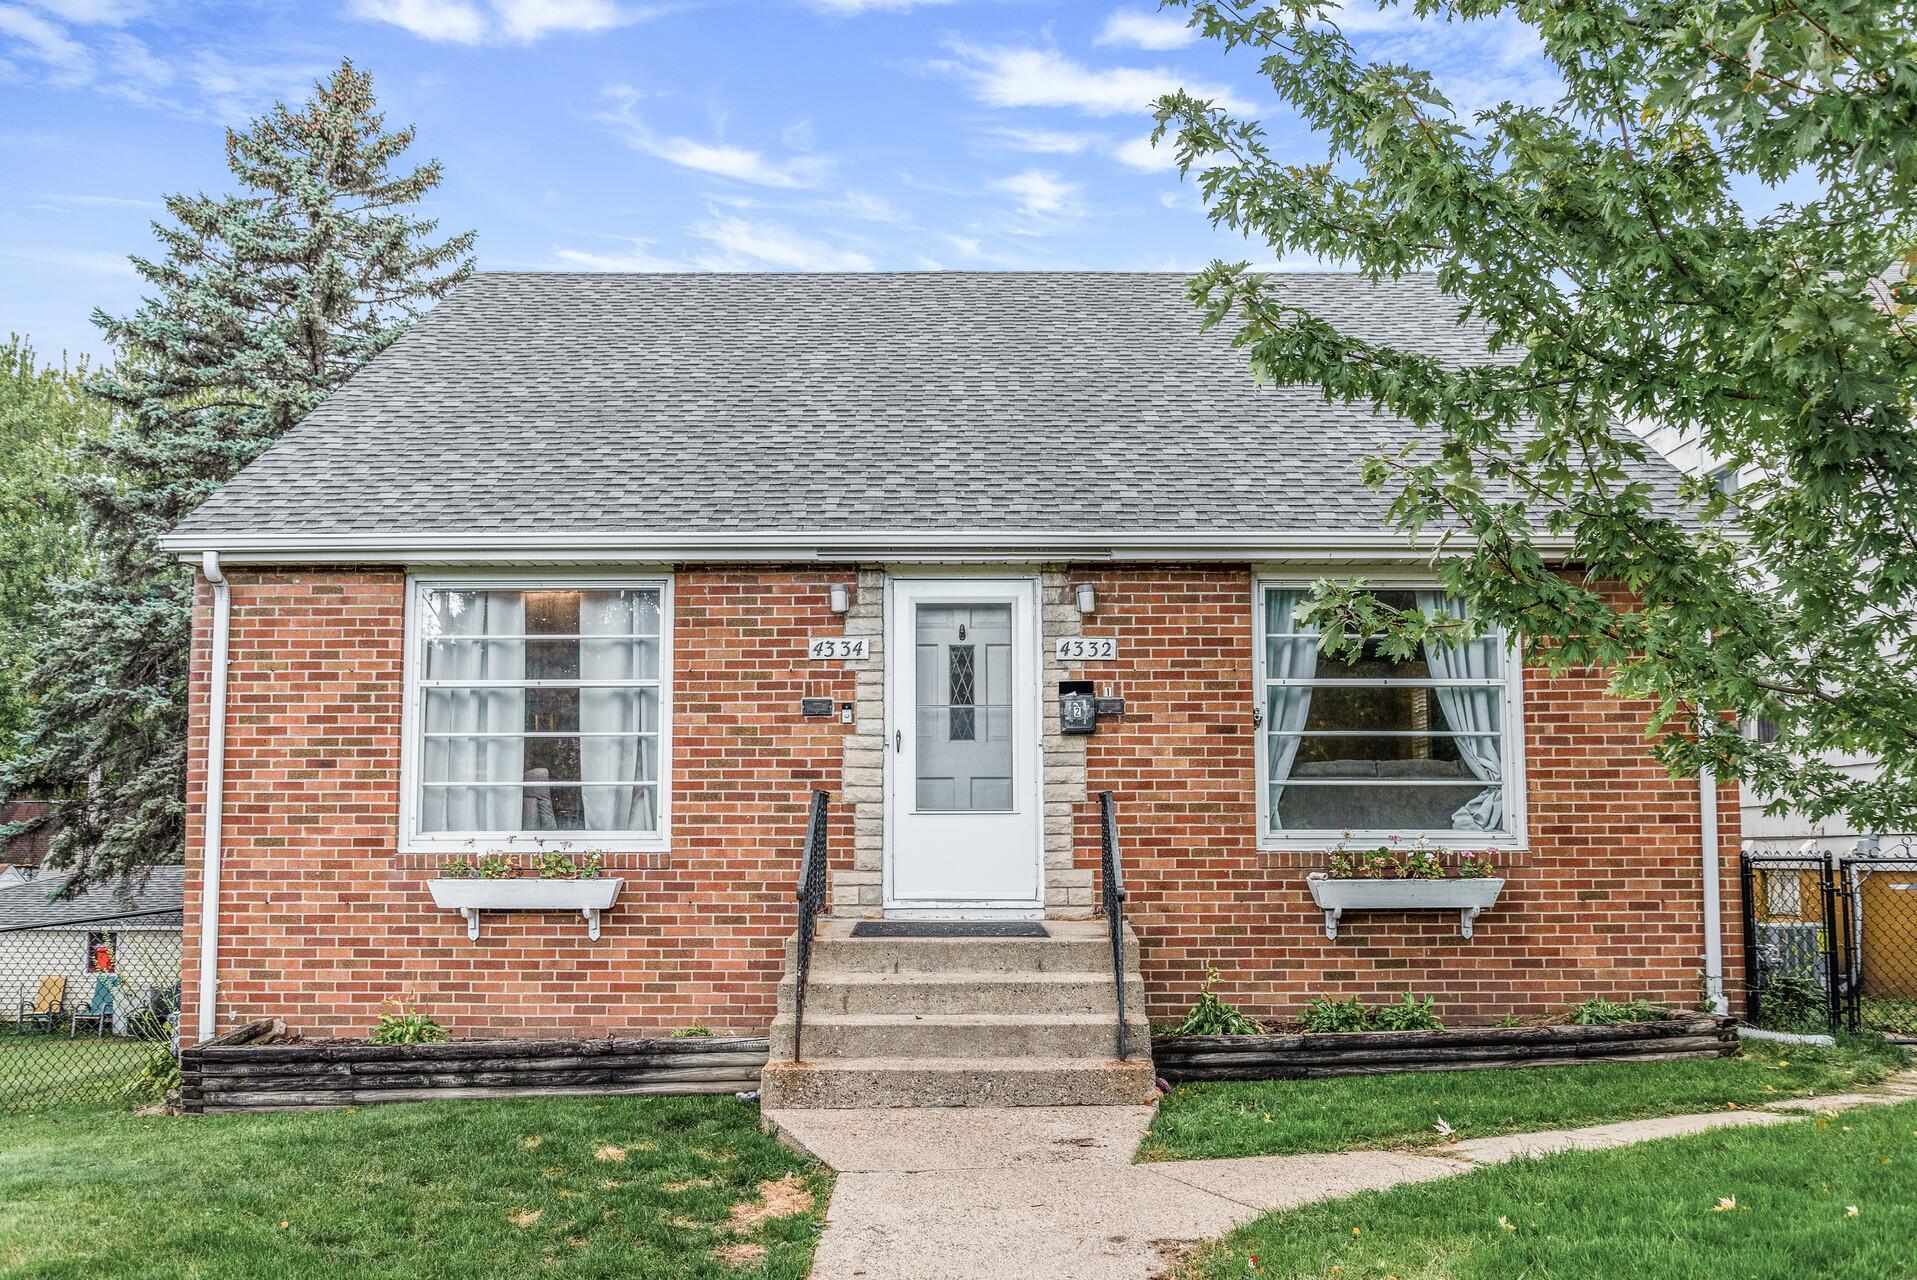 4332 Cedar Avenue S Property Photo - Minneapolis, MN real estate listing